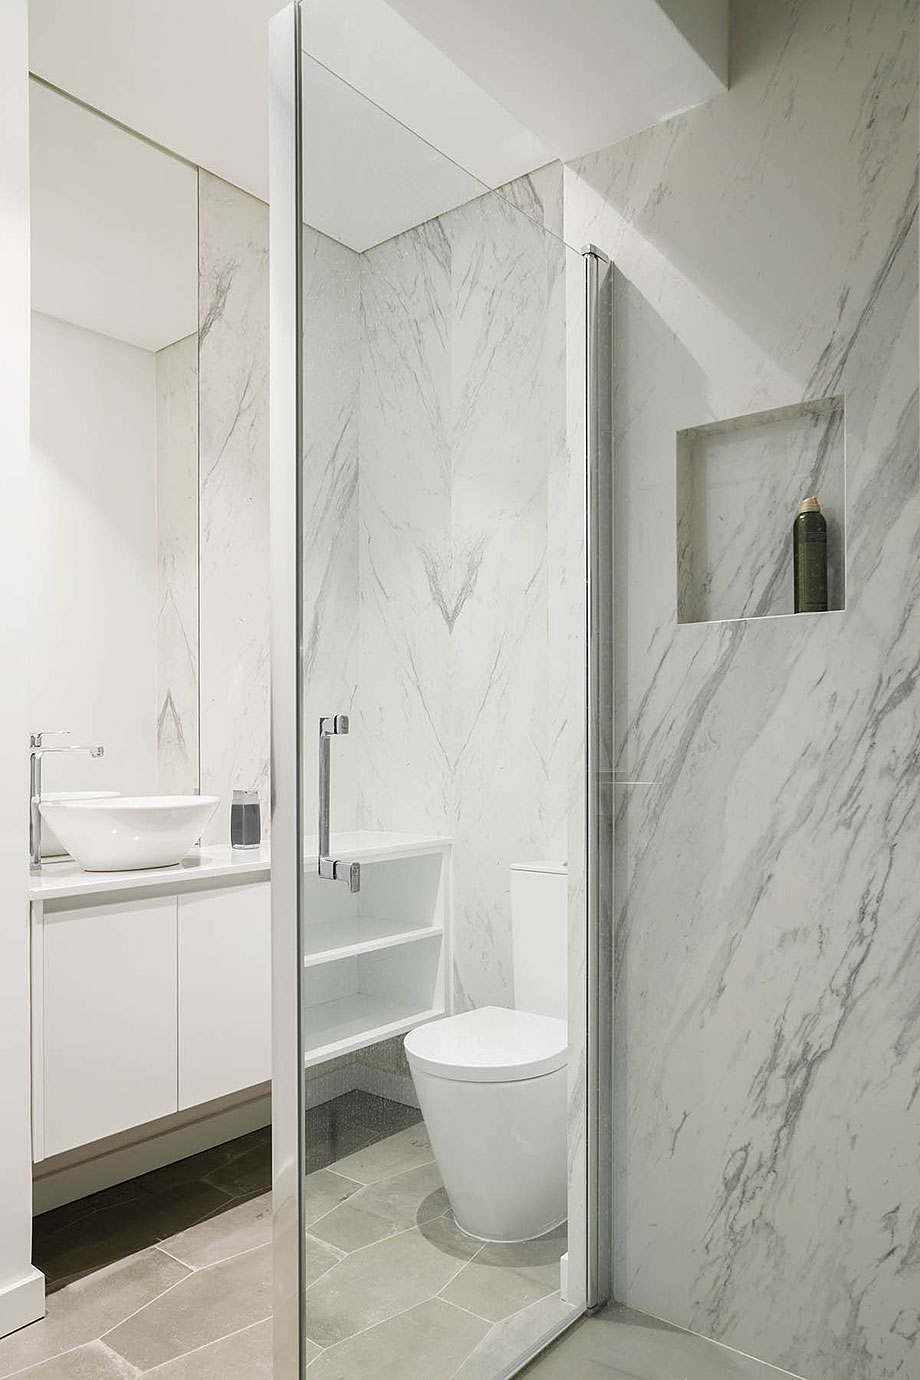 apartamento en oporto por paulo moreira architectures (17) - foto ivo tavares